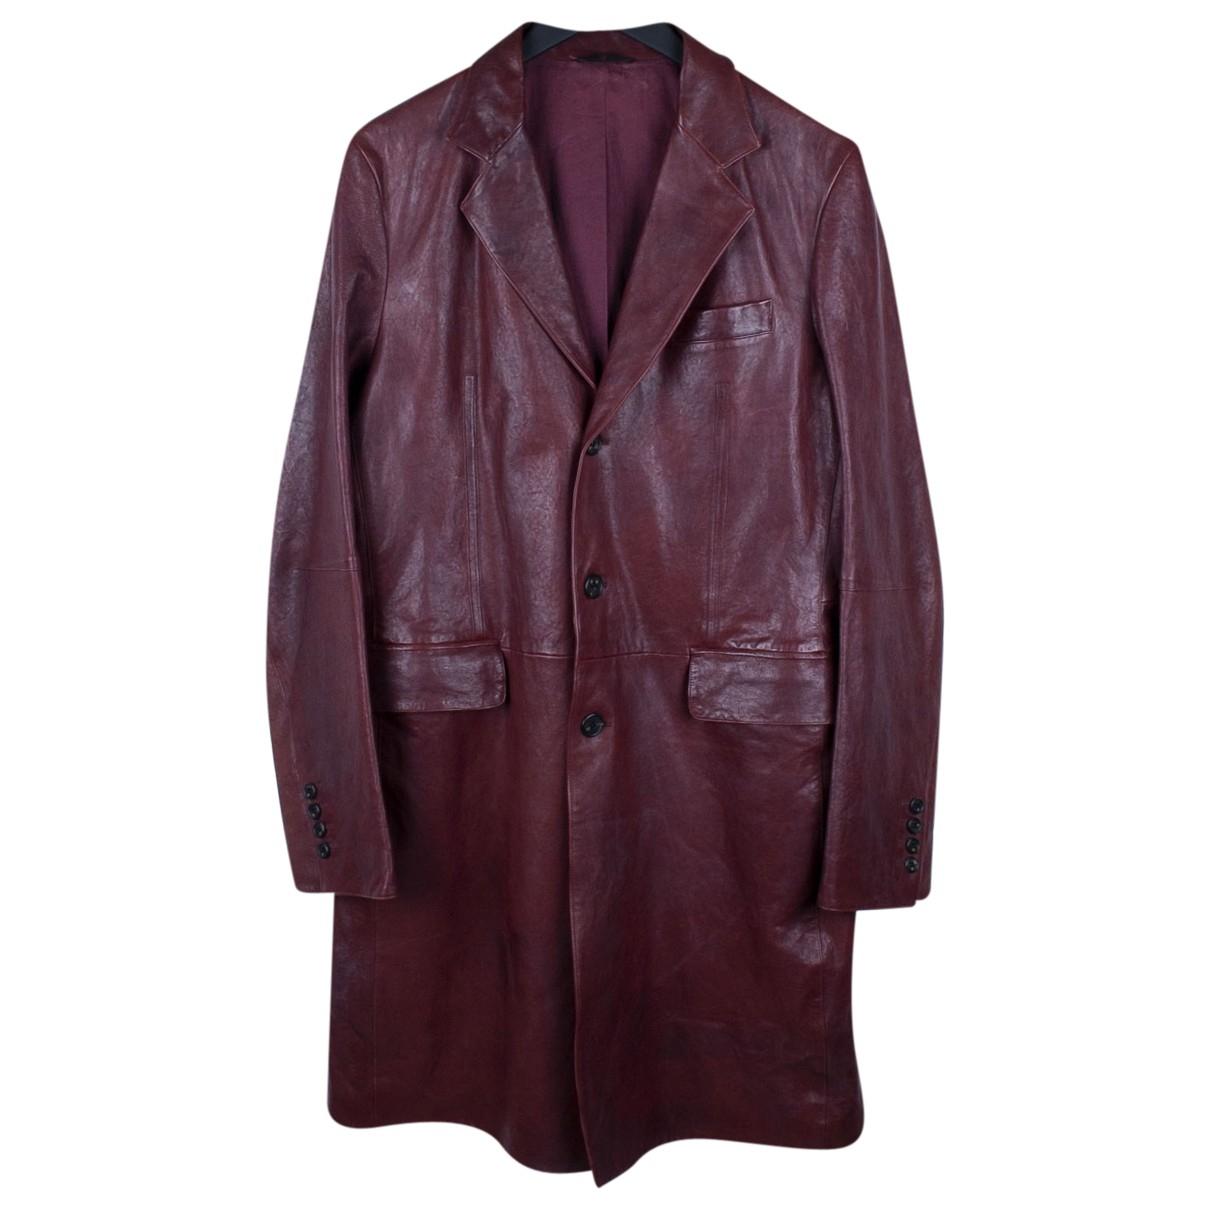 Yohji Yamamoto \N Burgundy Leather coat  for Men M International